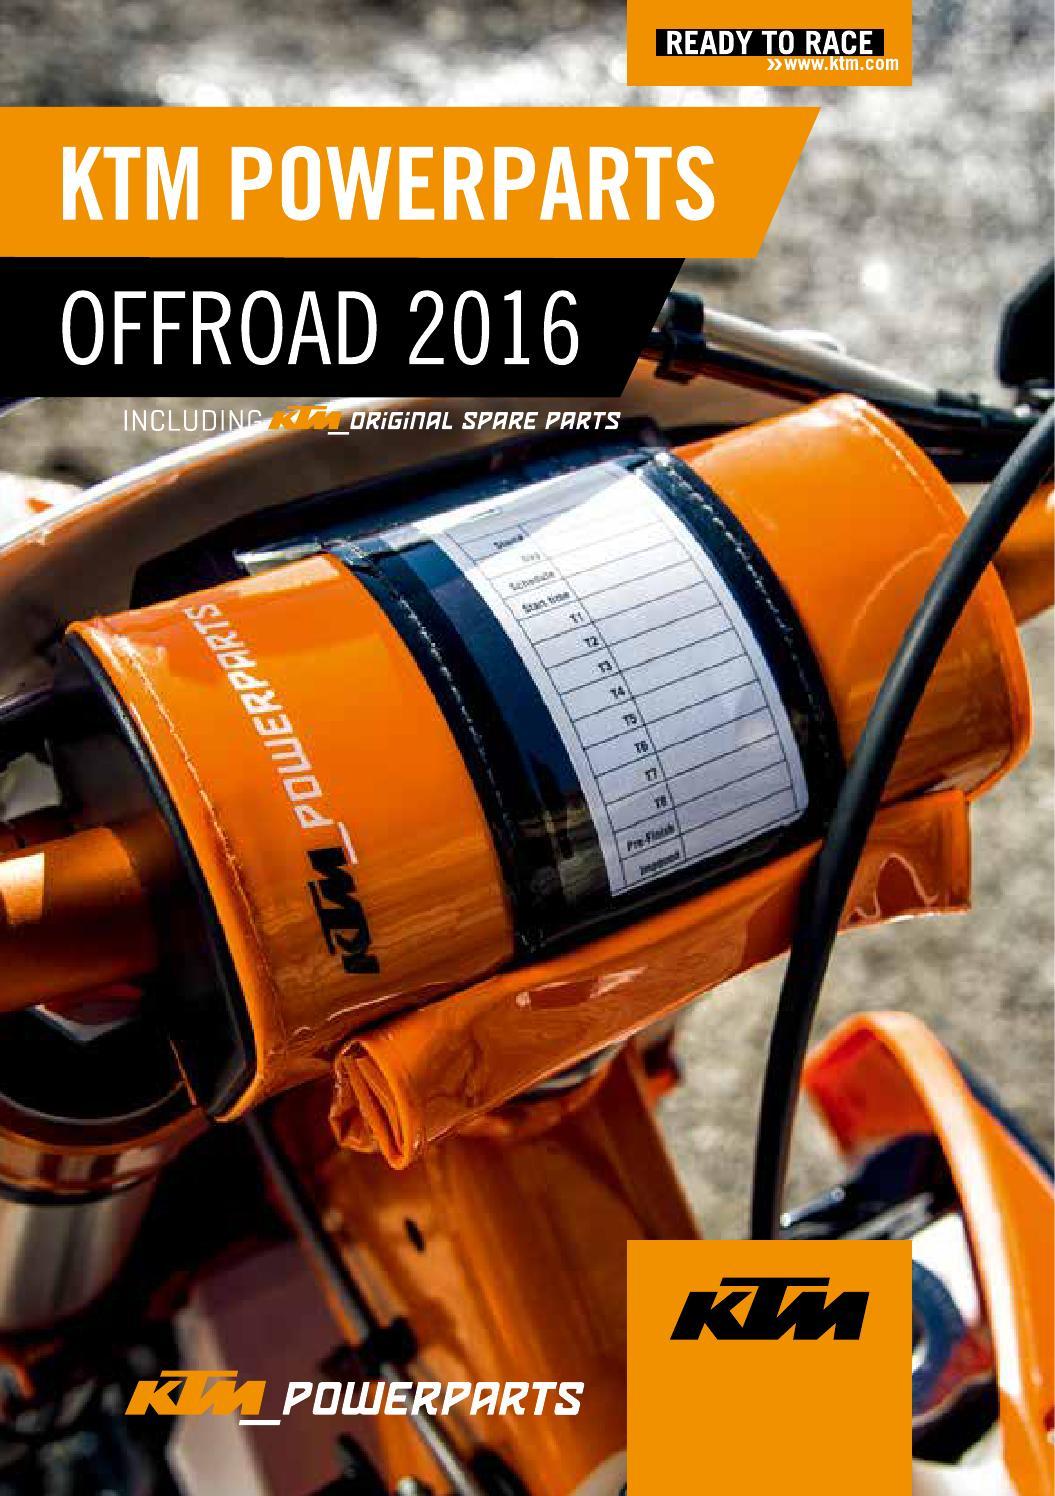 O-RING Orange DRIVE CHAIN Fits KTM 125 SX 1998 1999 2000 2001 02 03 04 05 06 07